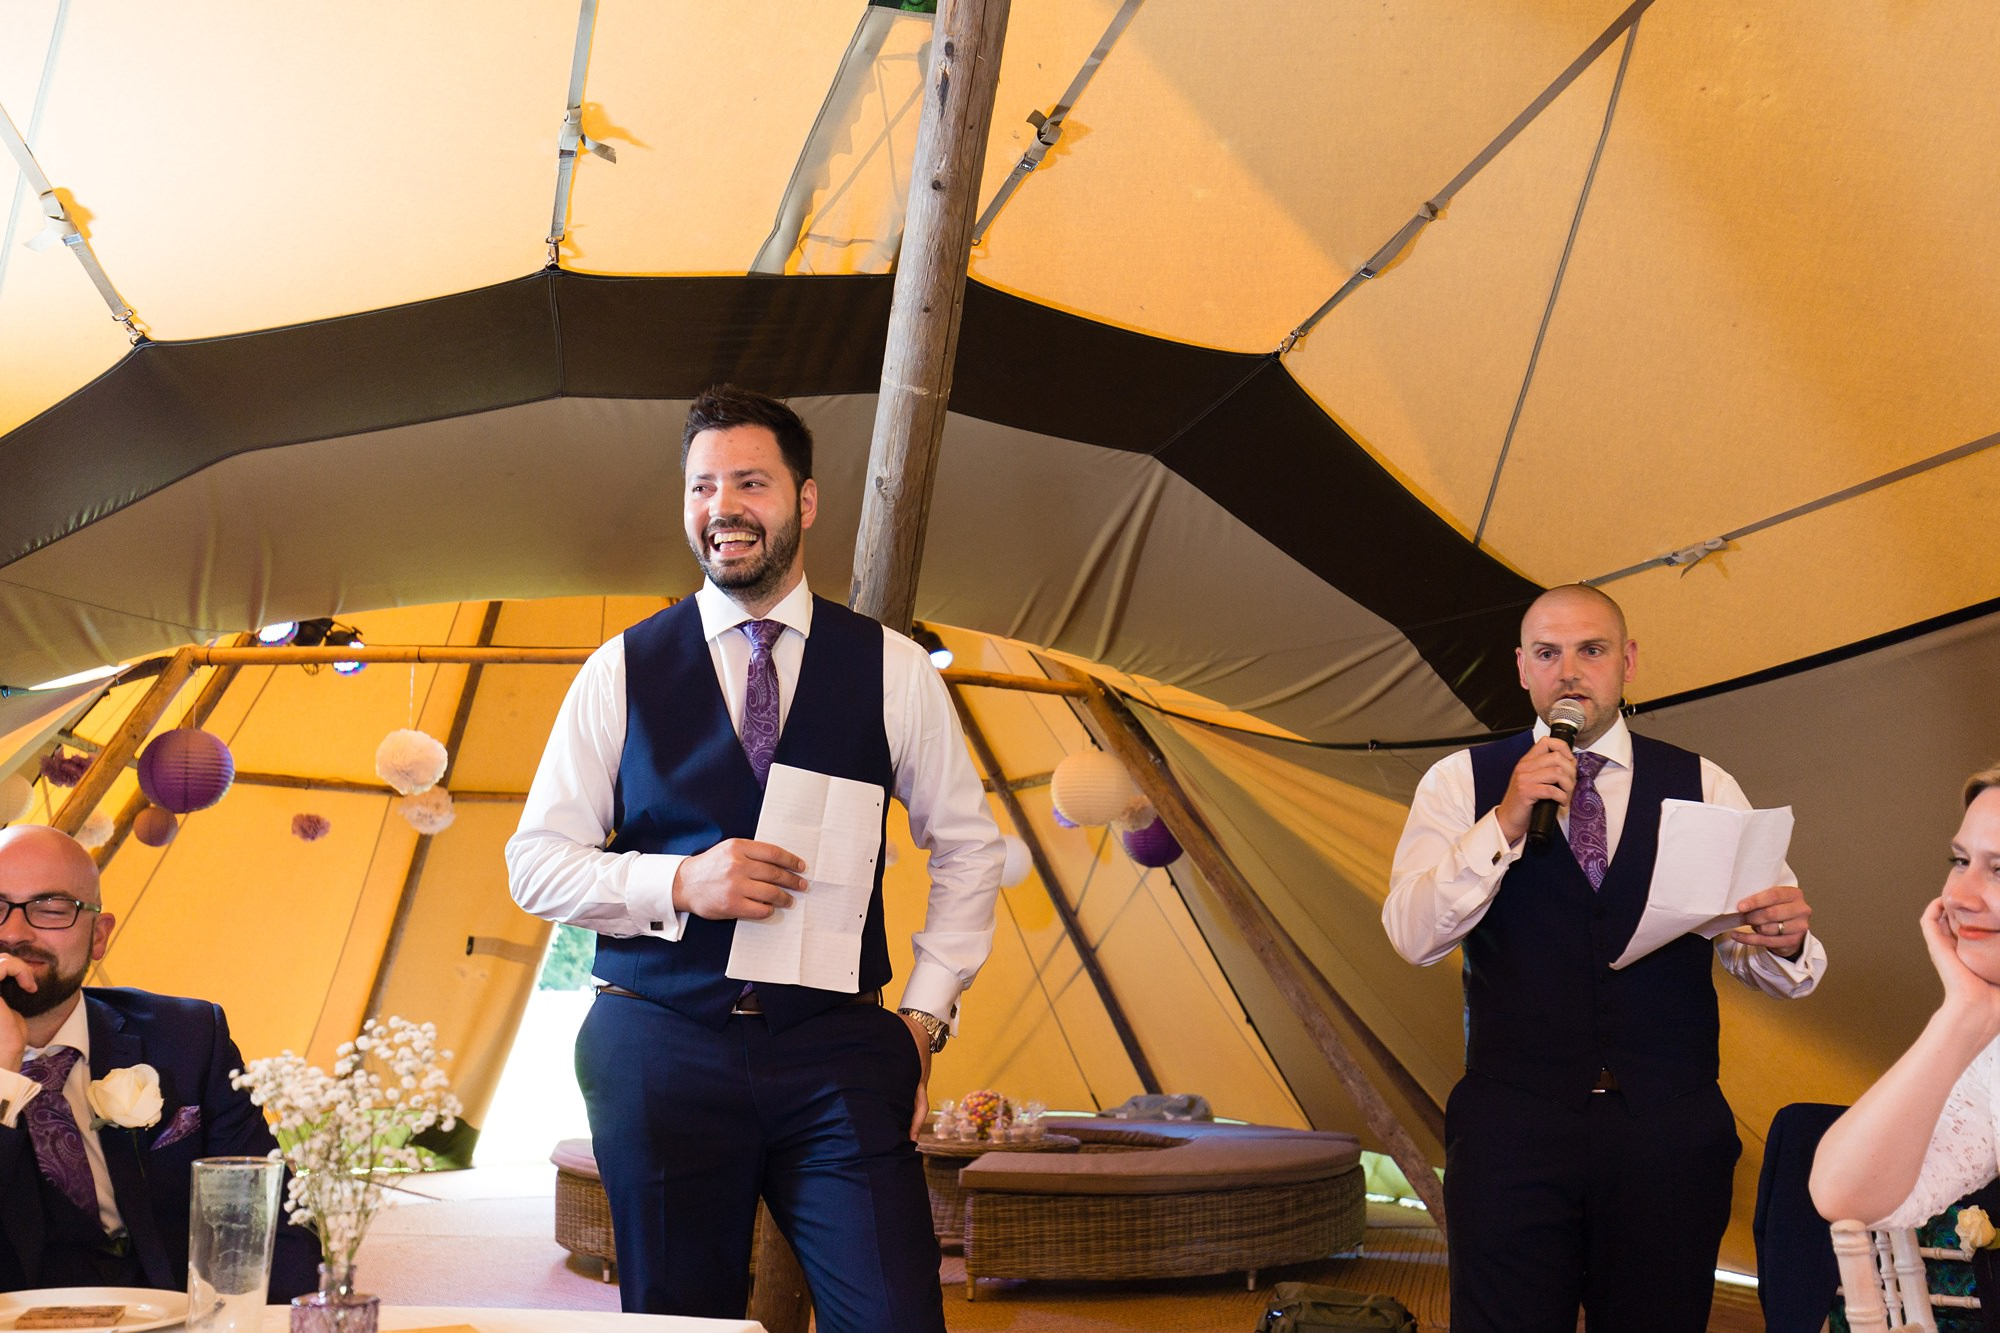 Bell Hall Wedding Photography speeches inside the tipi best man